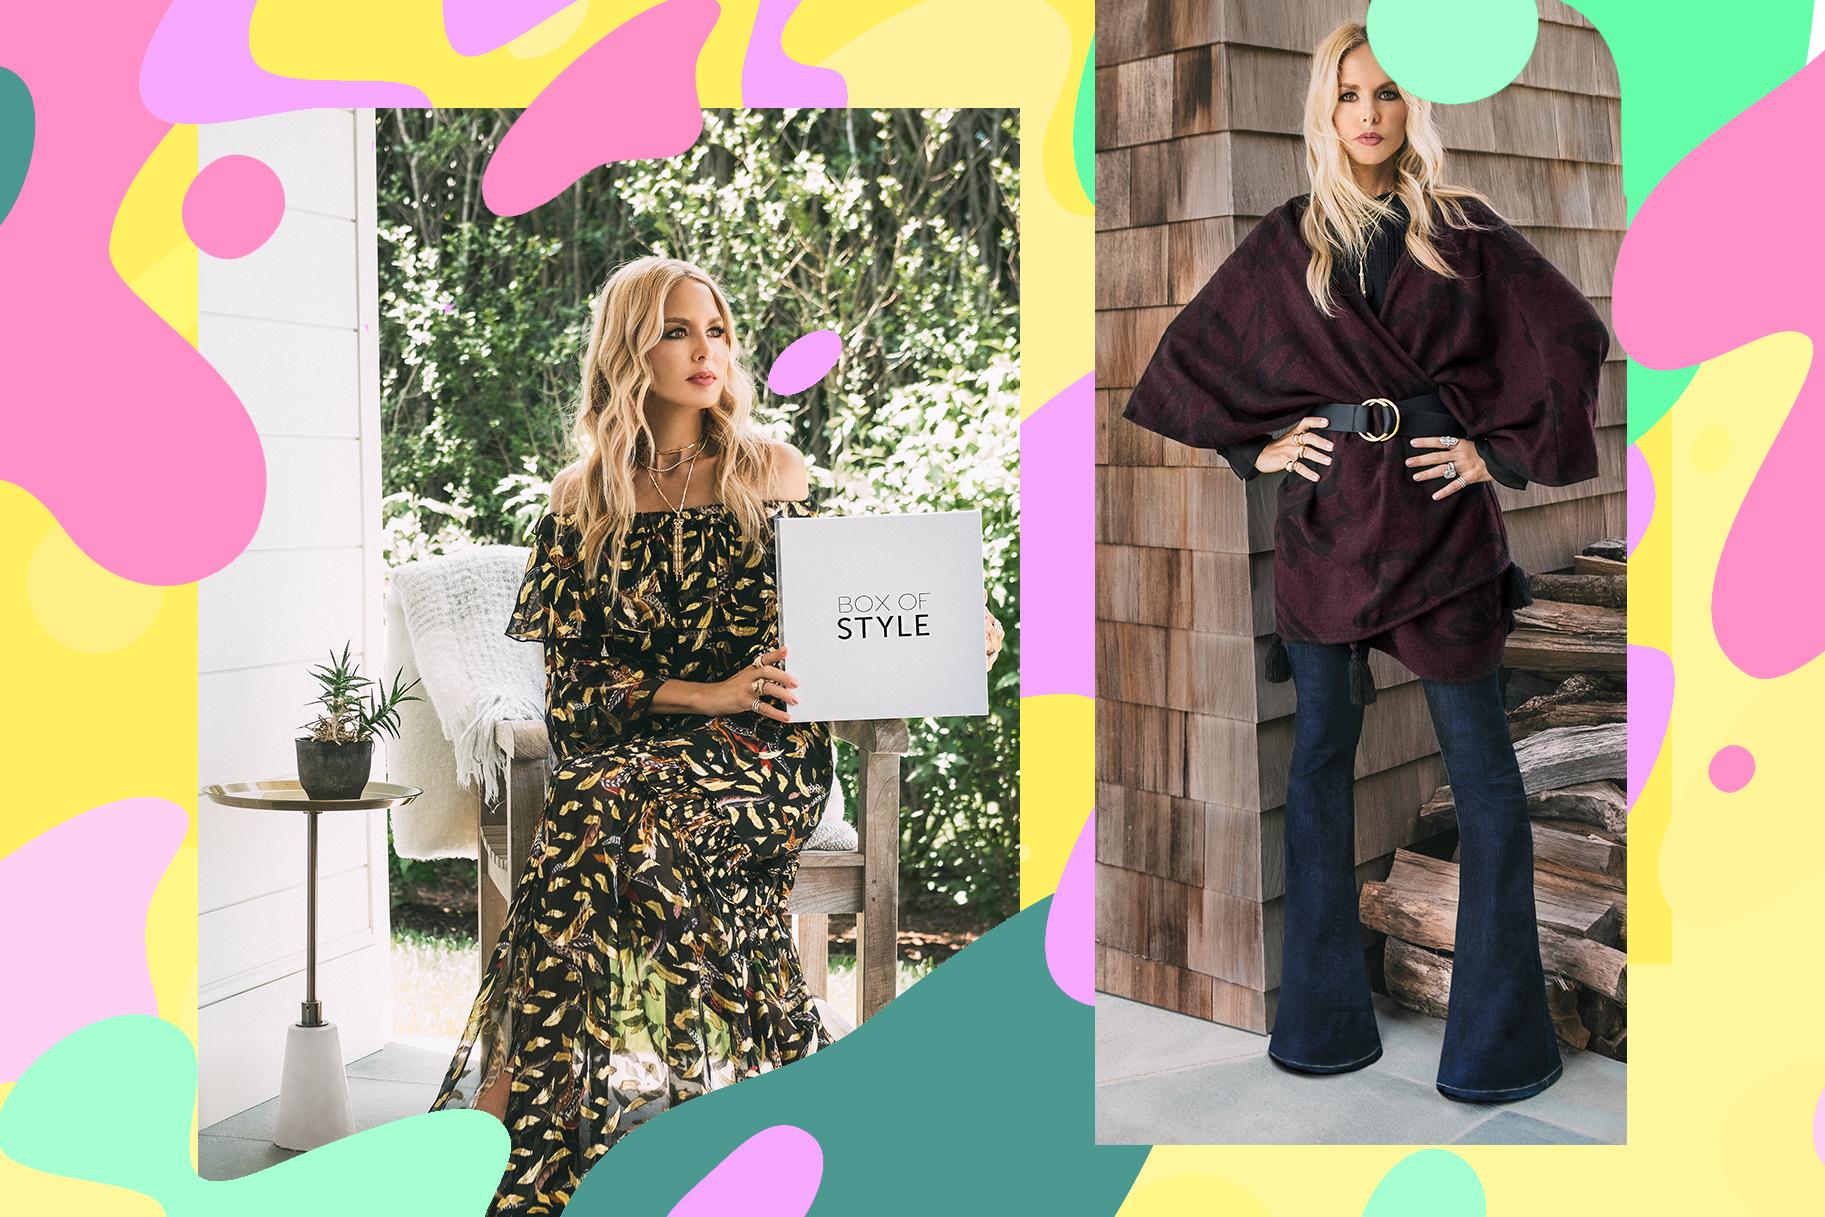 e844d2f7b7991 What's Inside Rachel Zoe's Fall 2018 Box of Style?